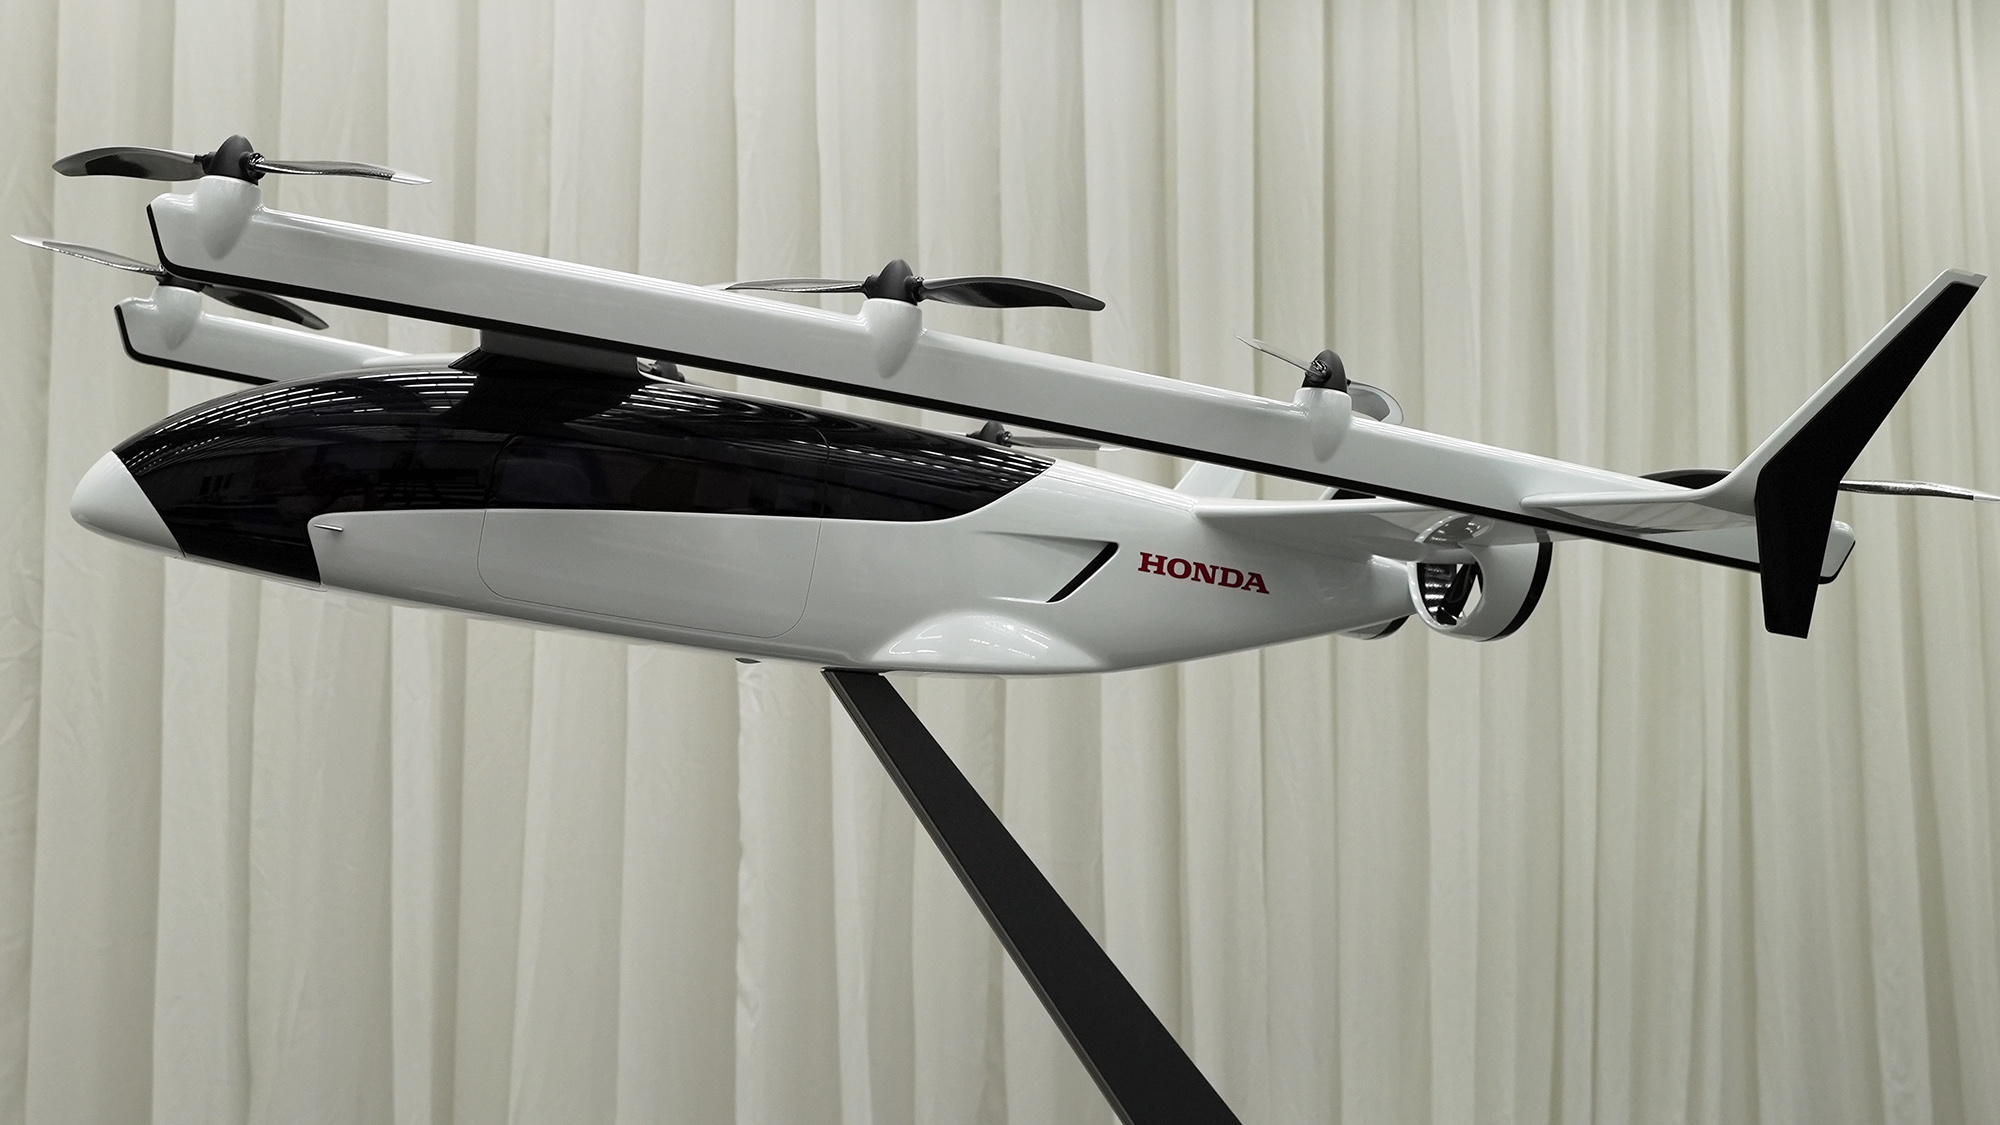 Miniatura dos táxis voadores da Honda